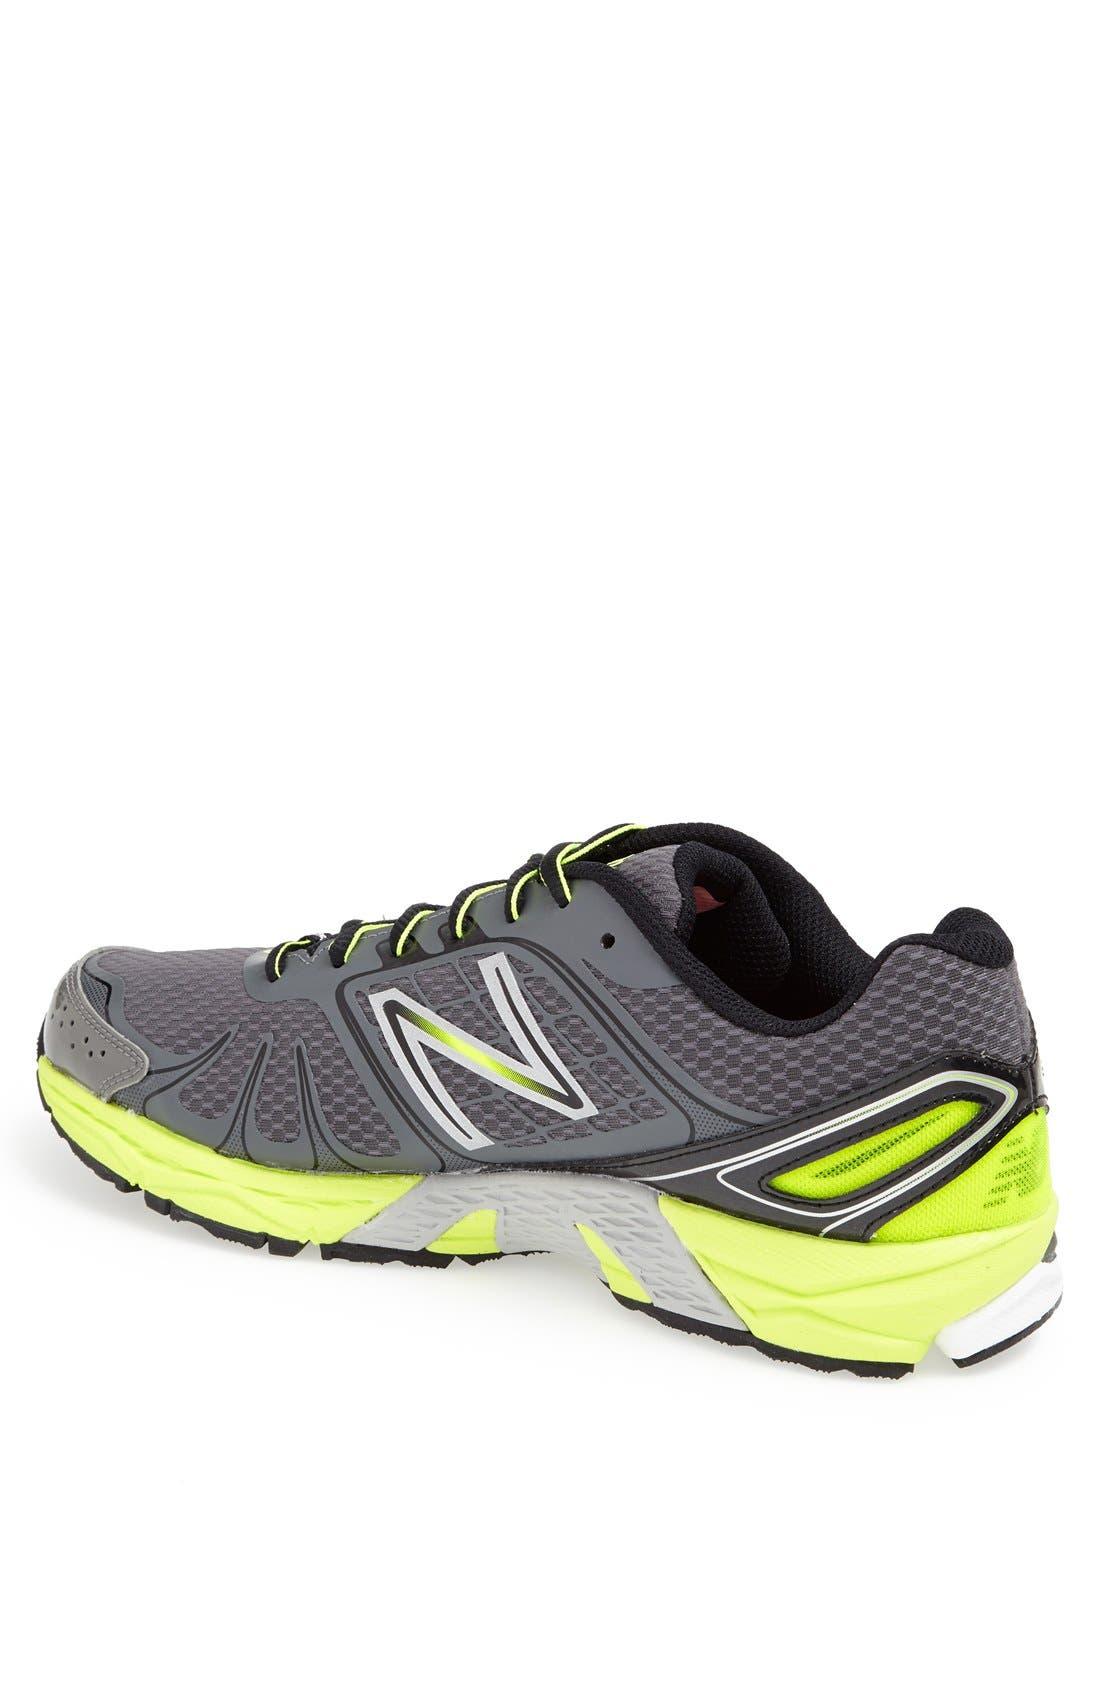 Alternate Image 2  - New Balance '770' Running Shoe (Men)